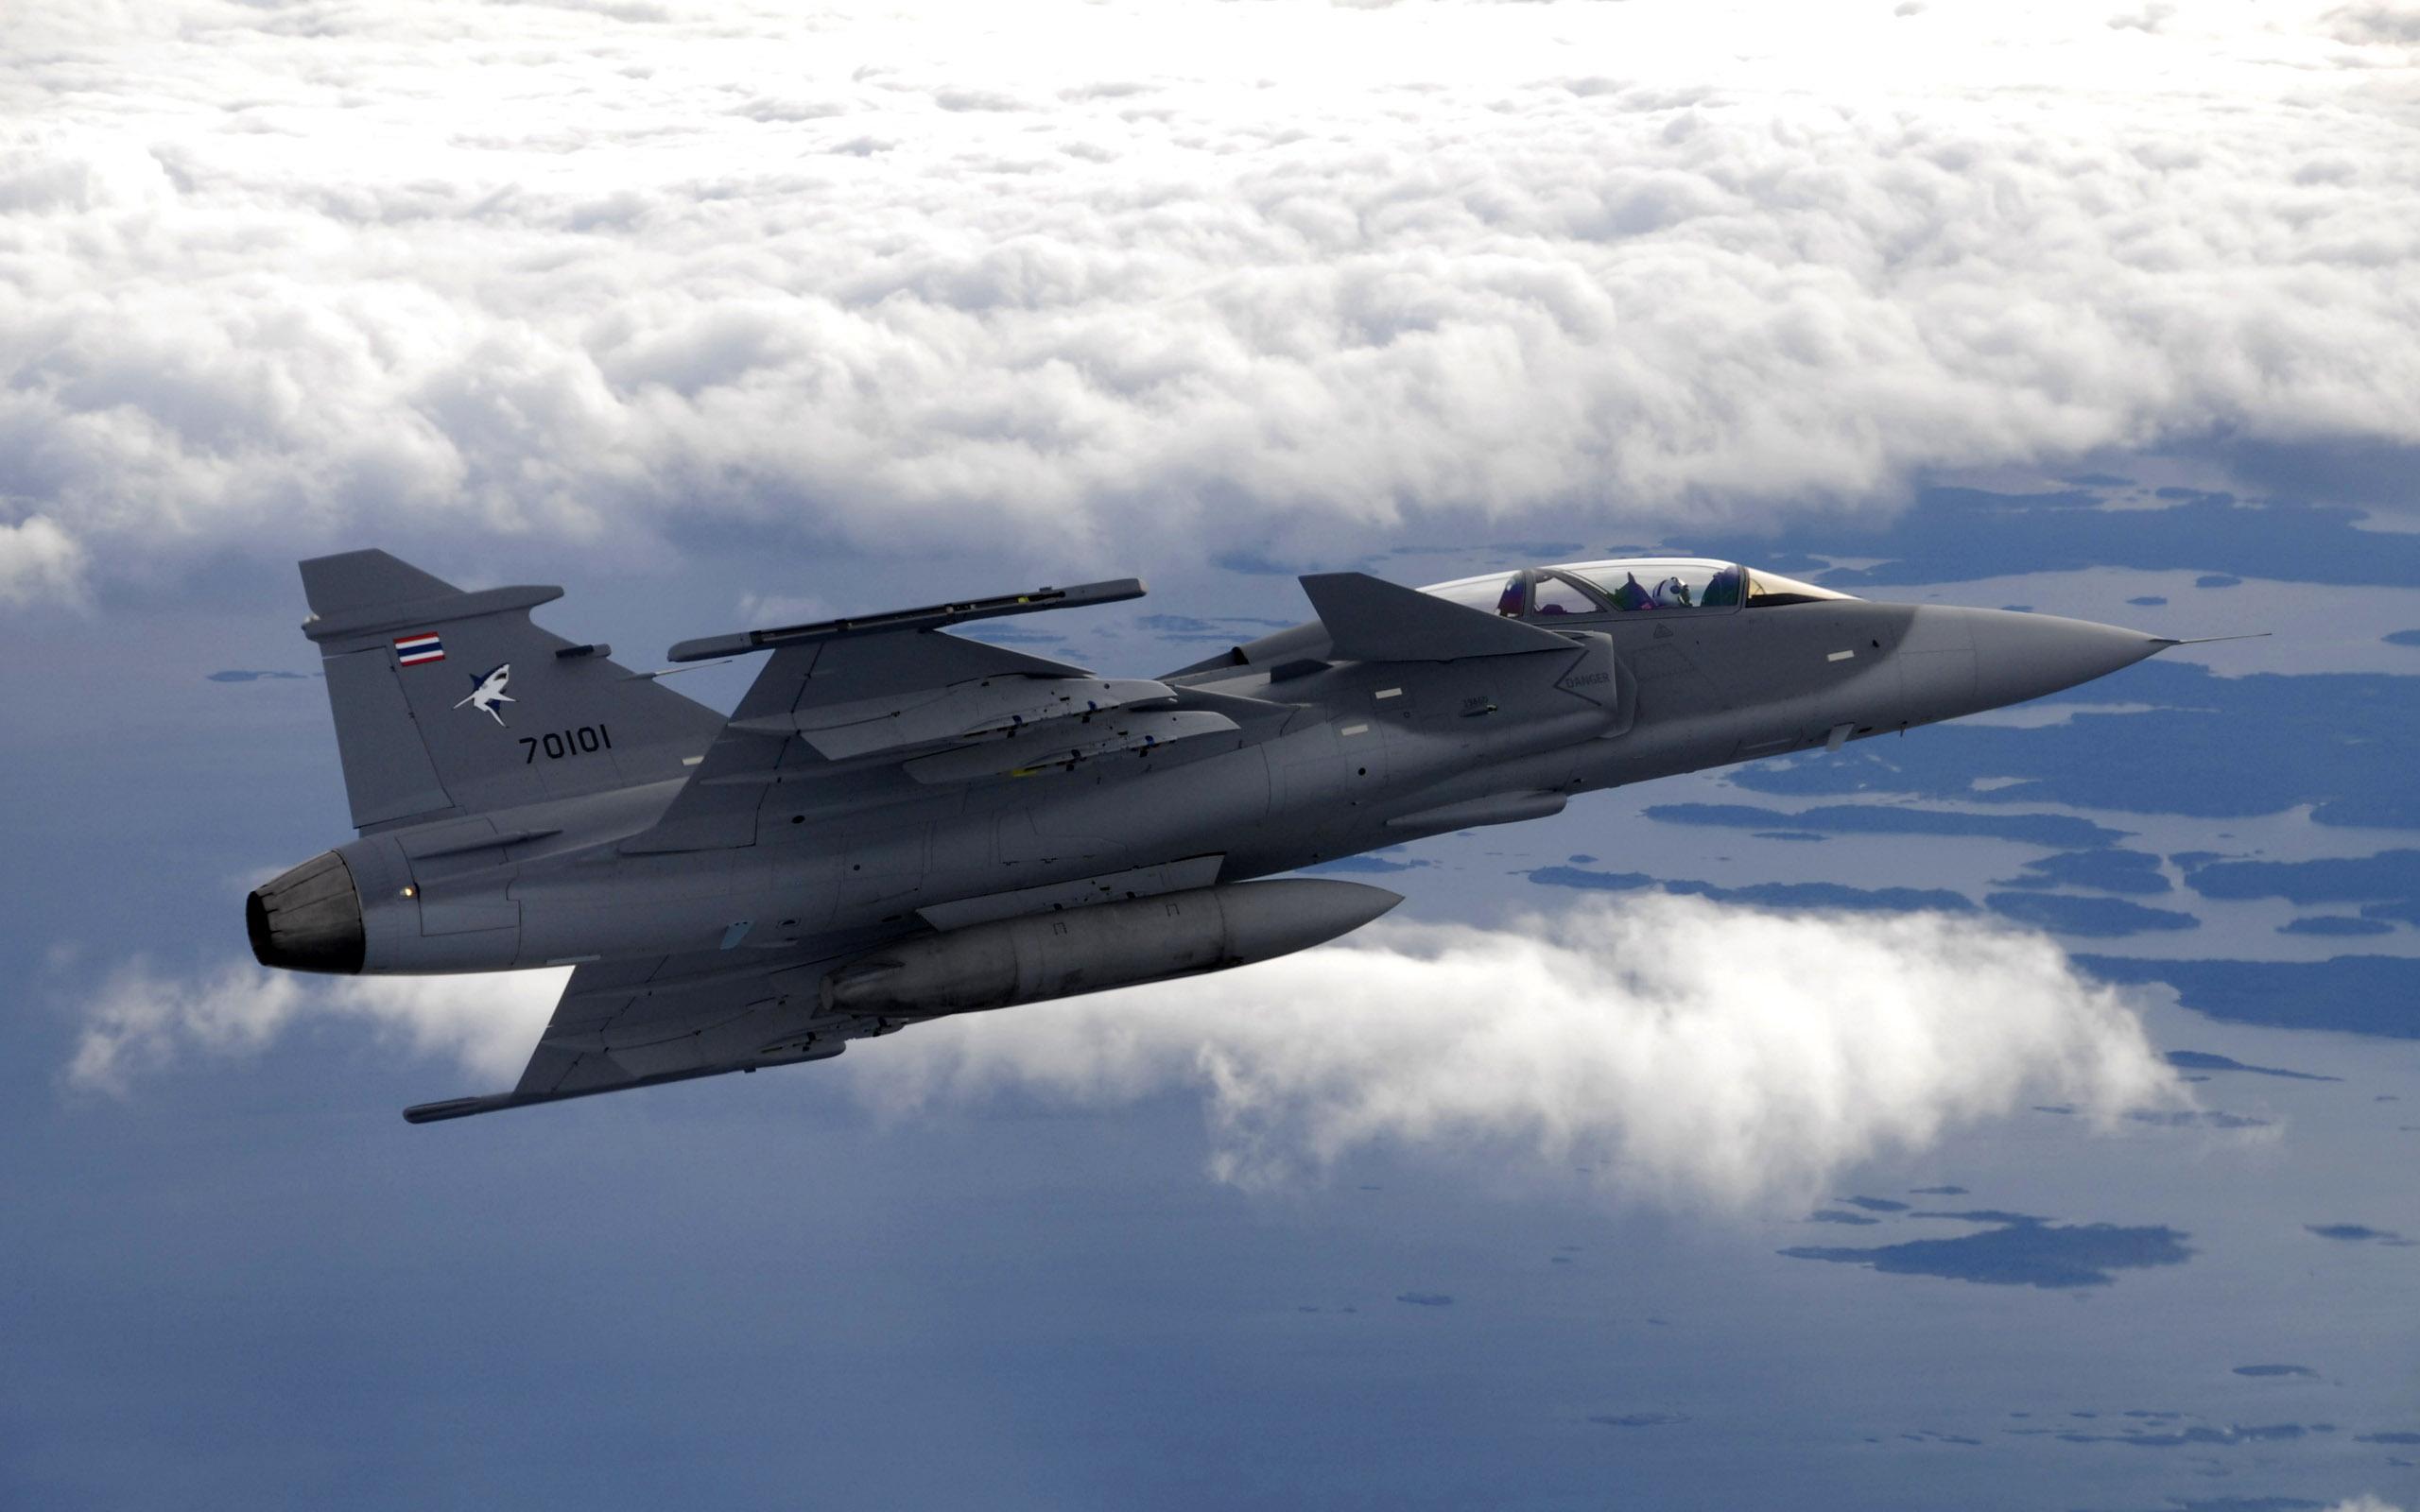 46] USAF Fighter Jet Wallpapers on WallpaperSafari 2560x1600